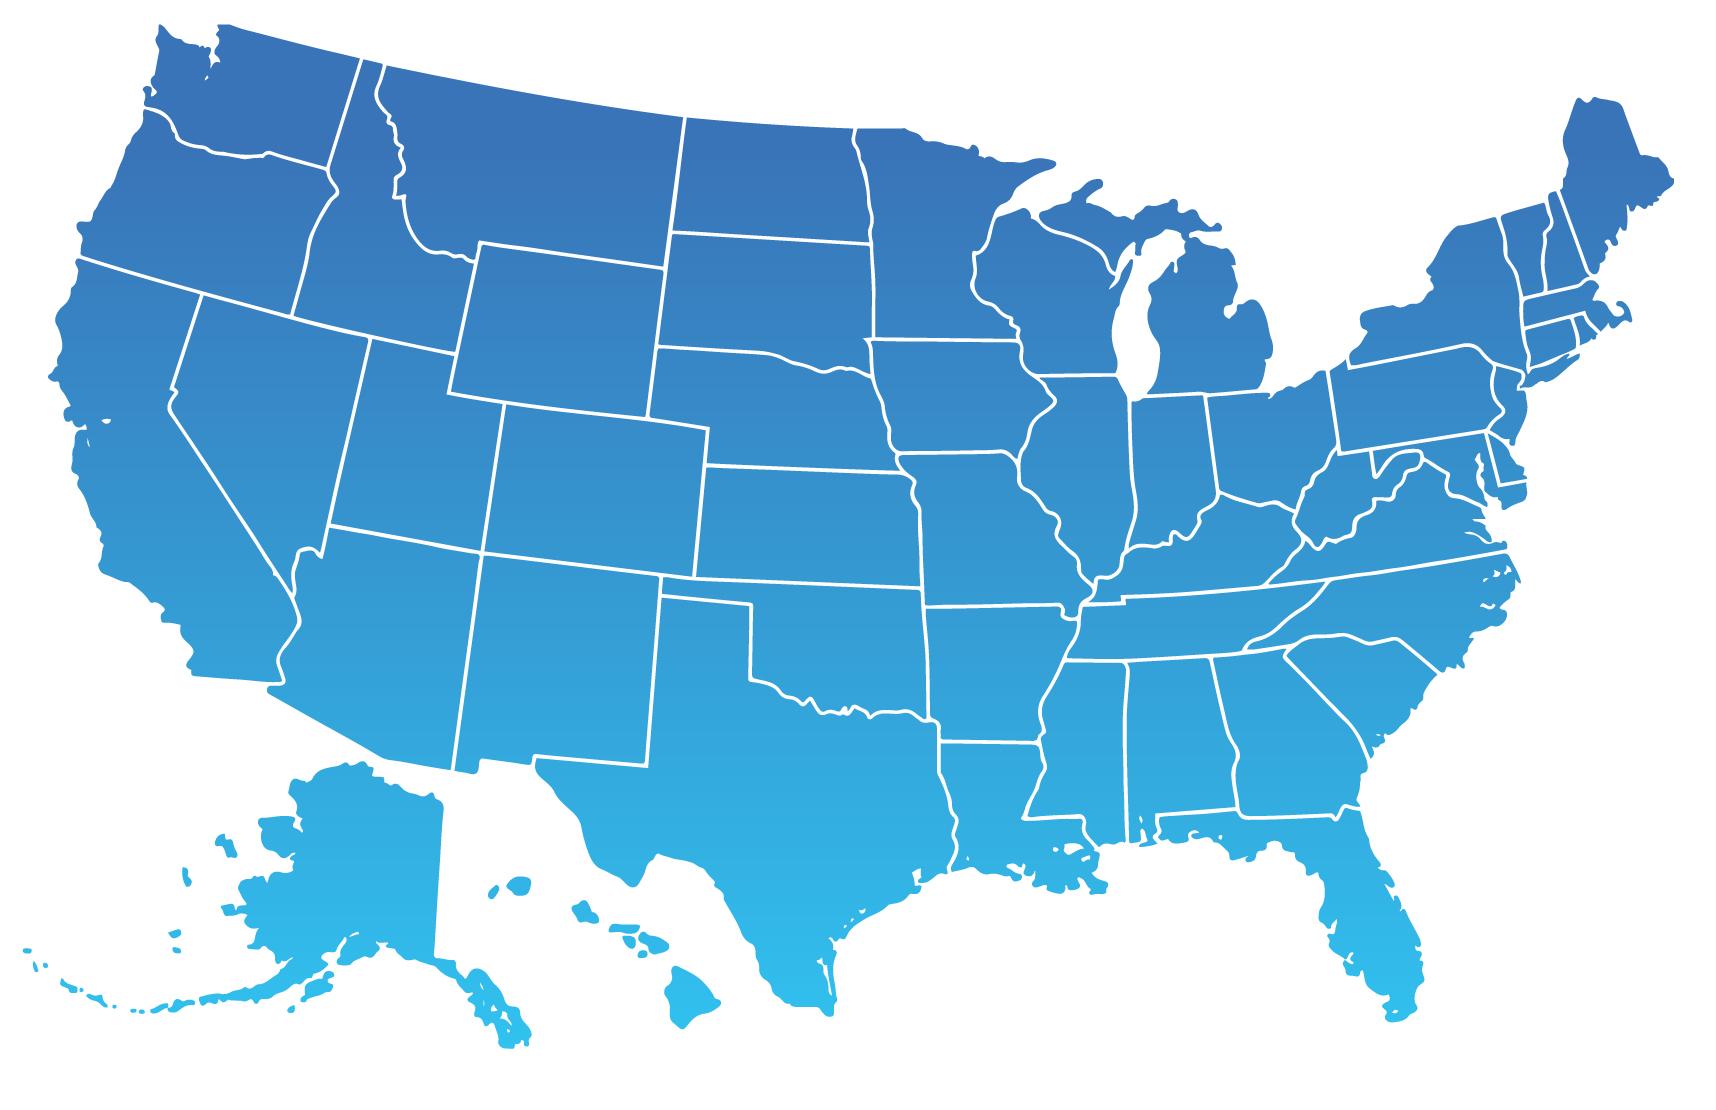 USA-map-blank.jpg